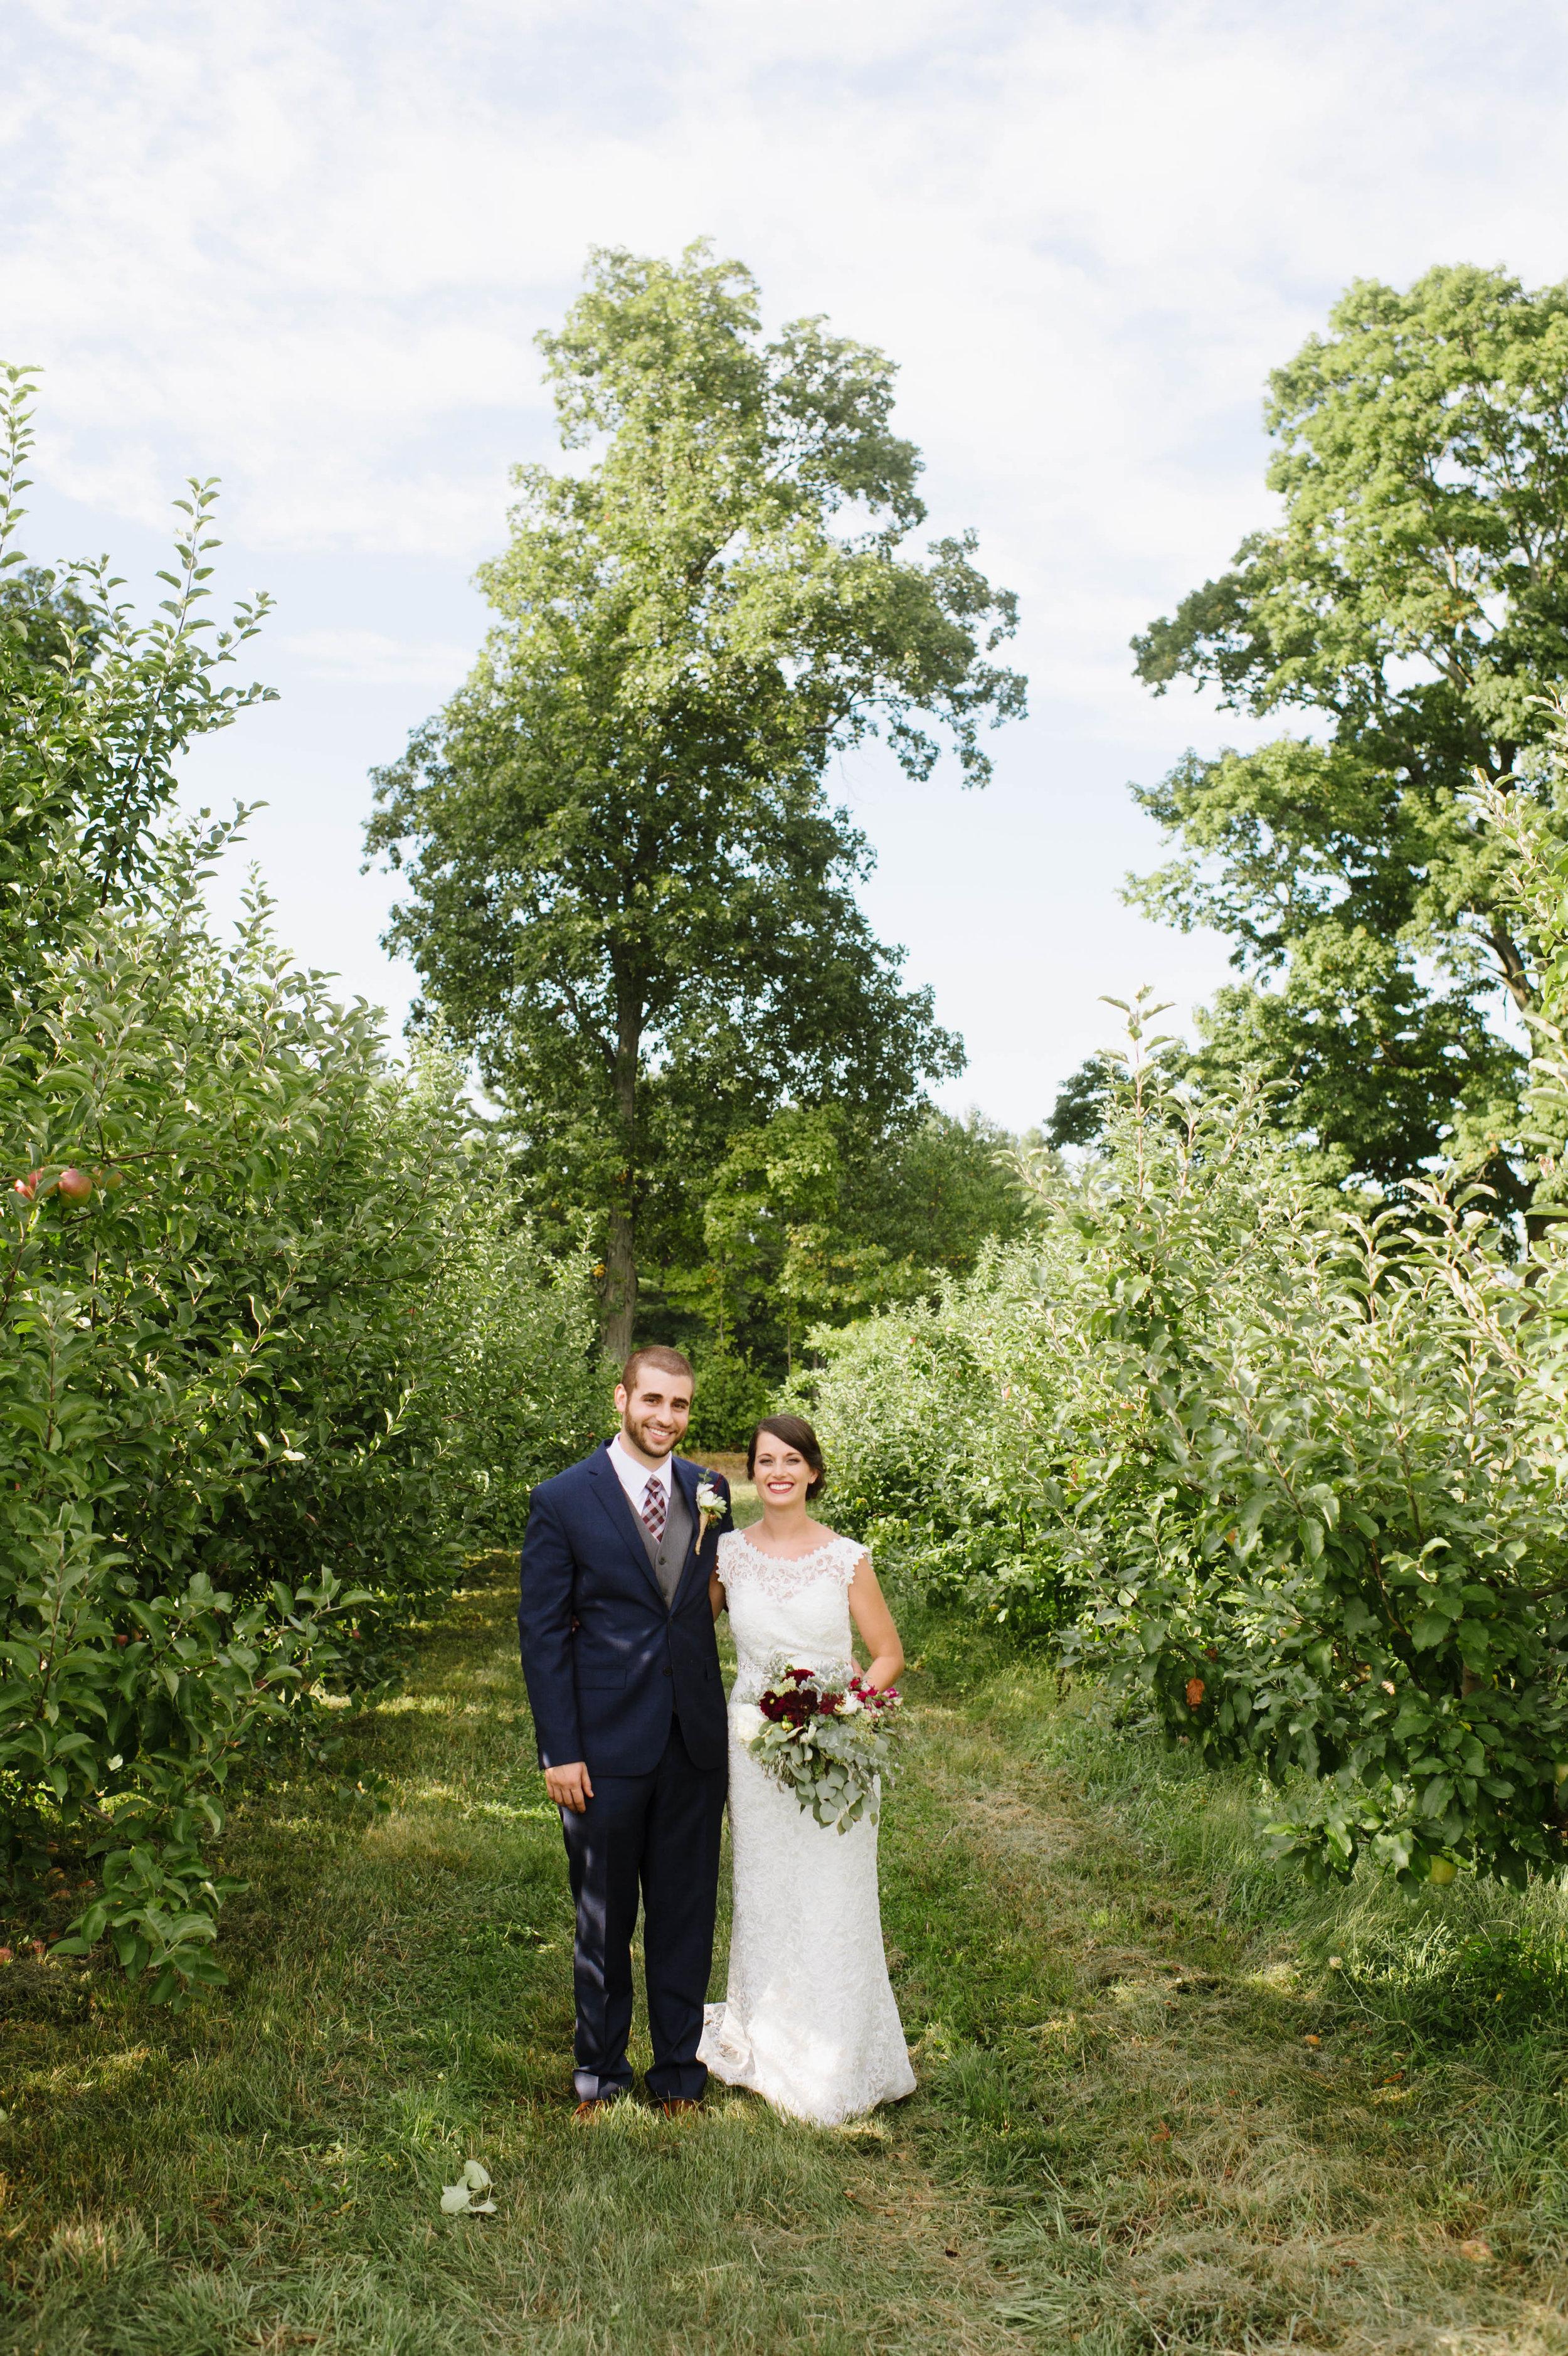 Candid-Wedding-Photography-Boston003.jpg